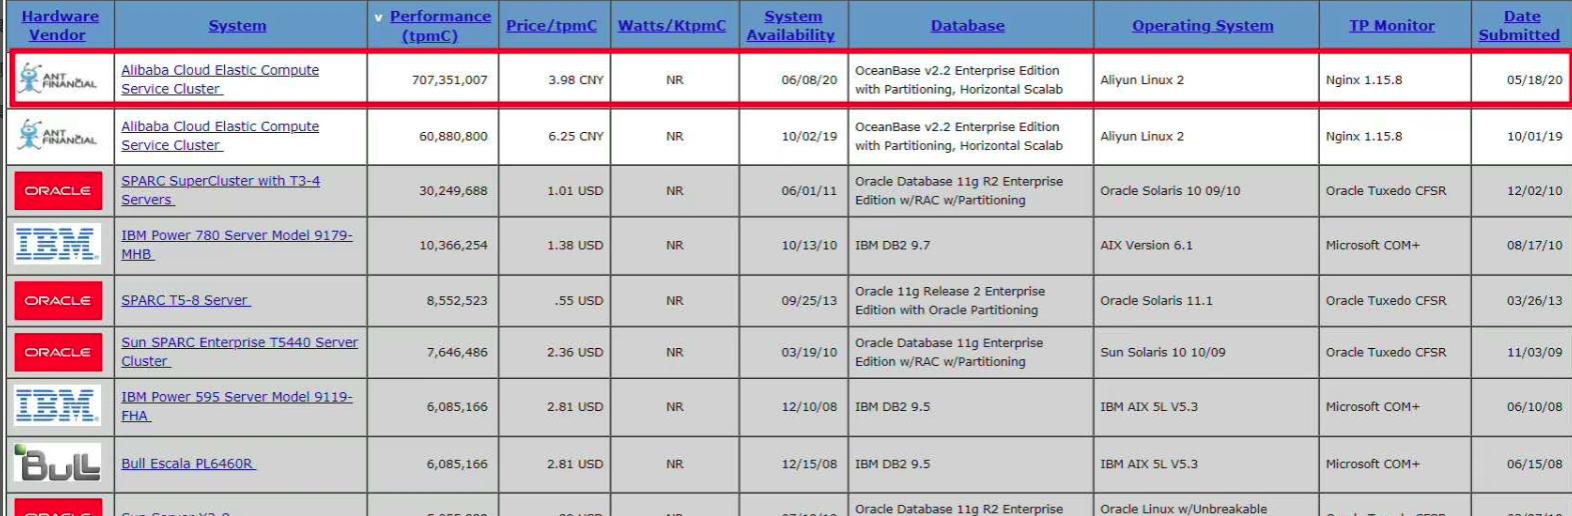 OceanBase 二次 TPC-C 测试性能提升 10 倍OceanBase 二次 TPC-C 测试性能提升 10 倍